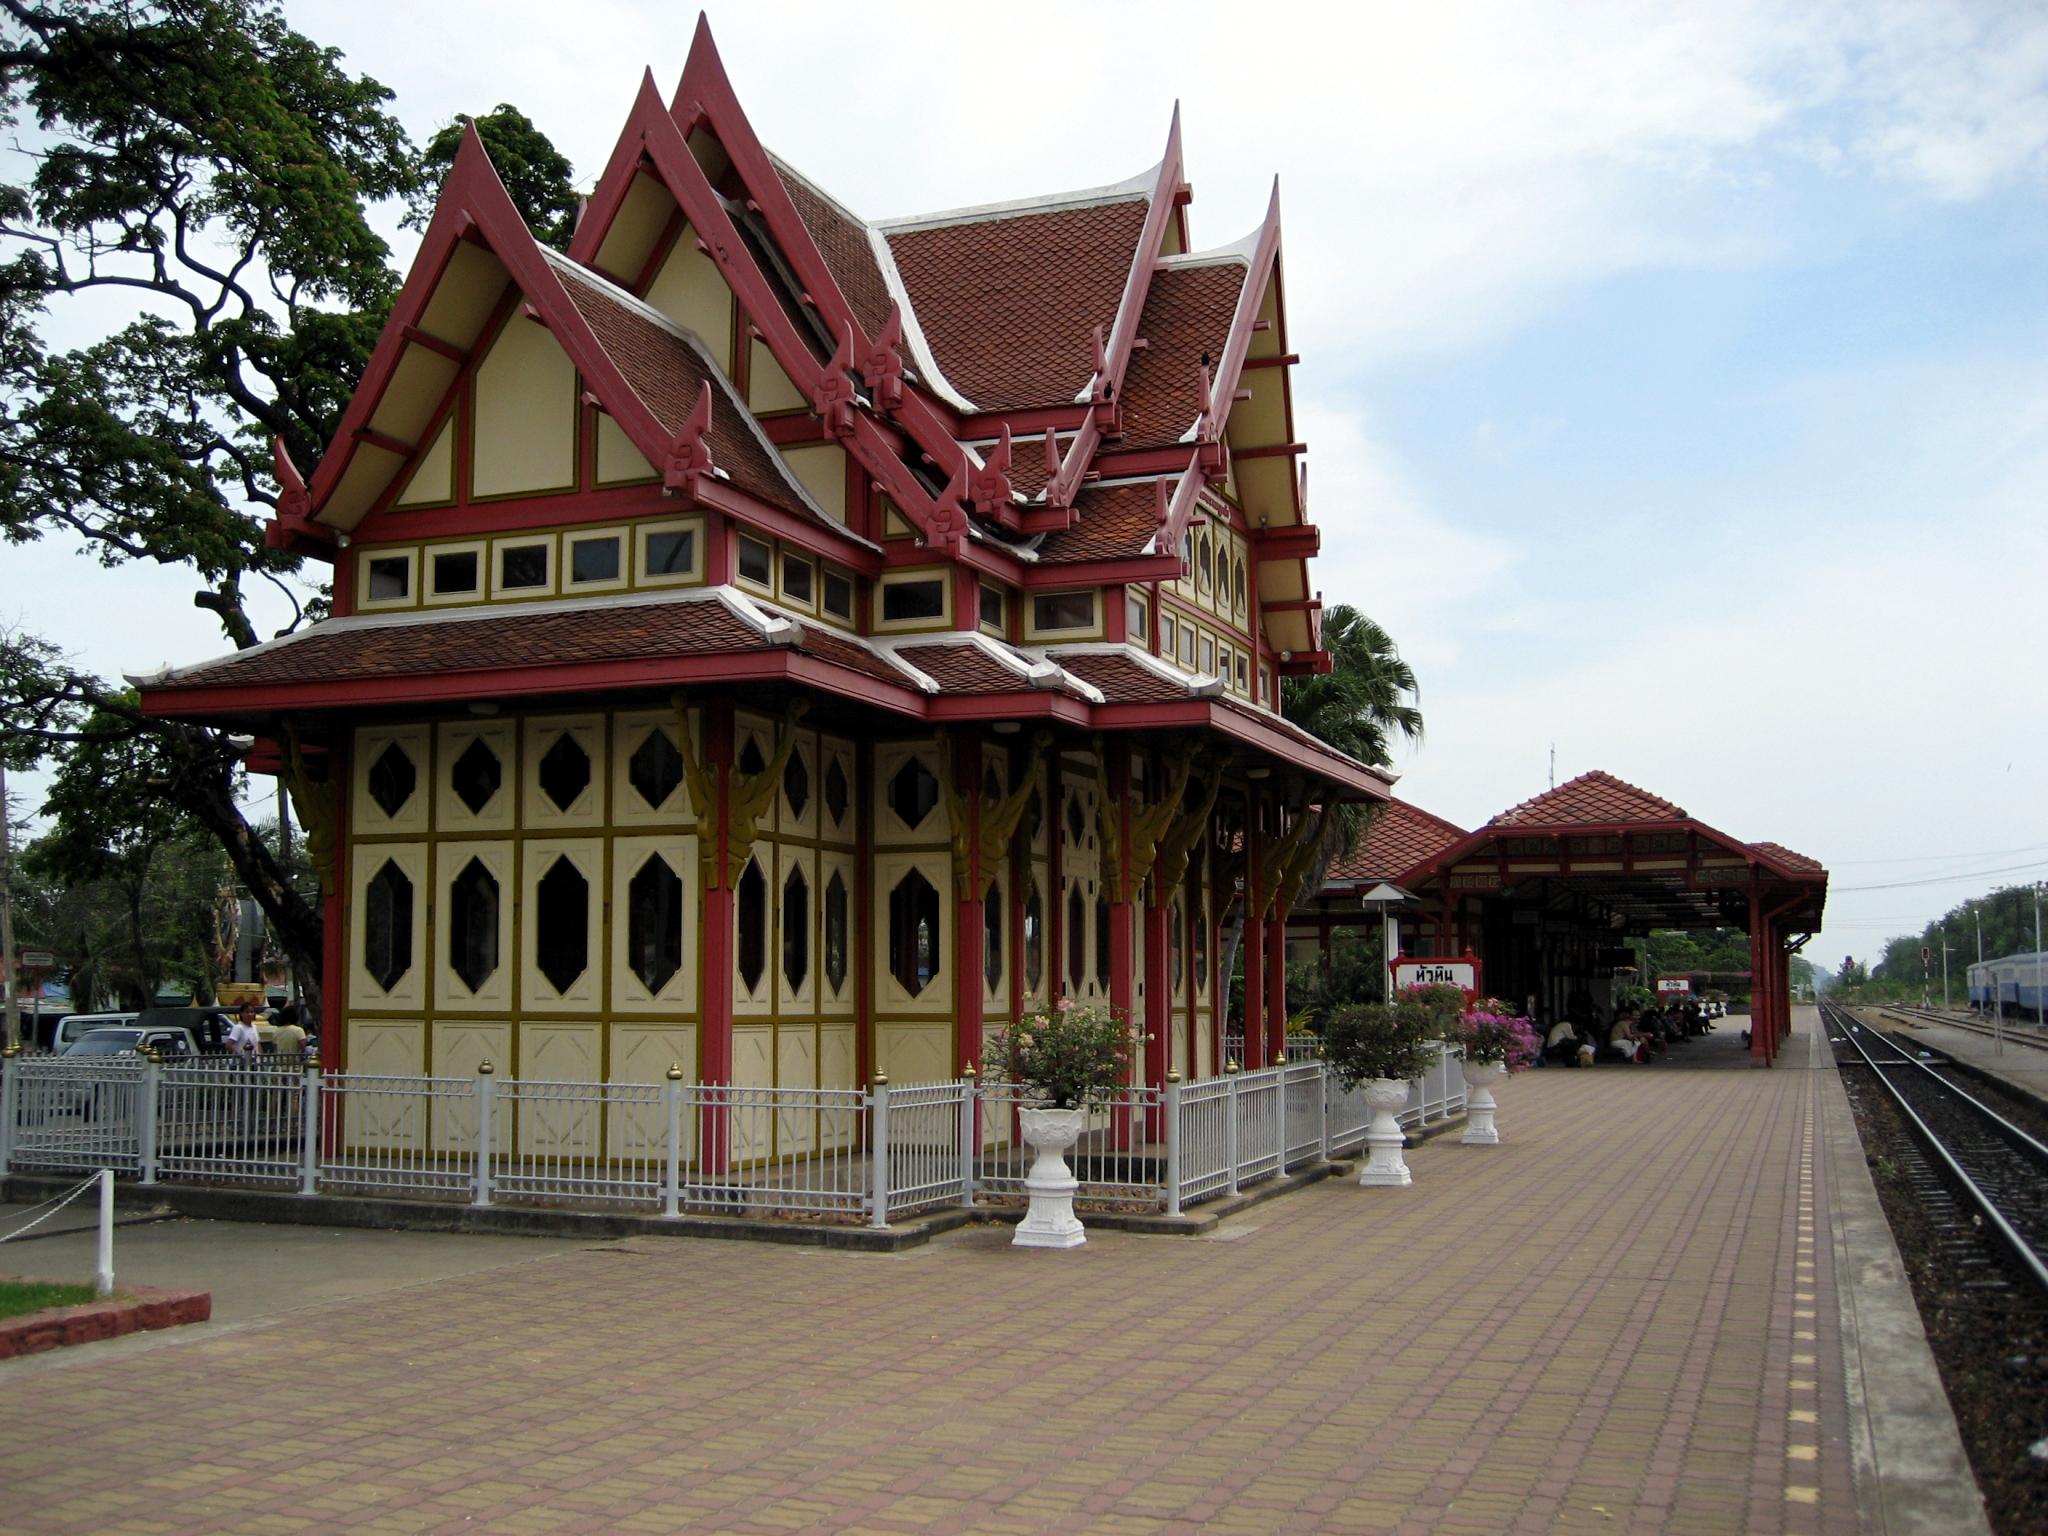 Hua_Hin_Railway_Station_Thailand The best way to see Thailand - Excerpt (4)